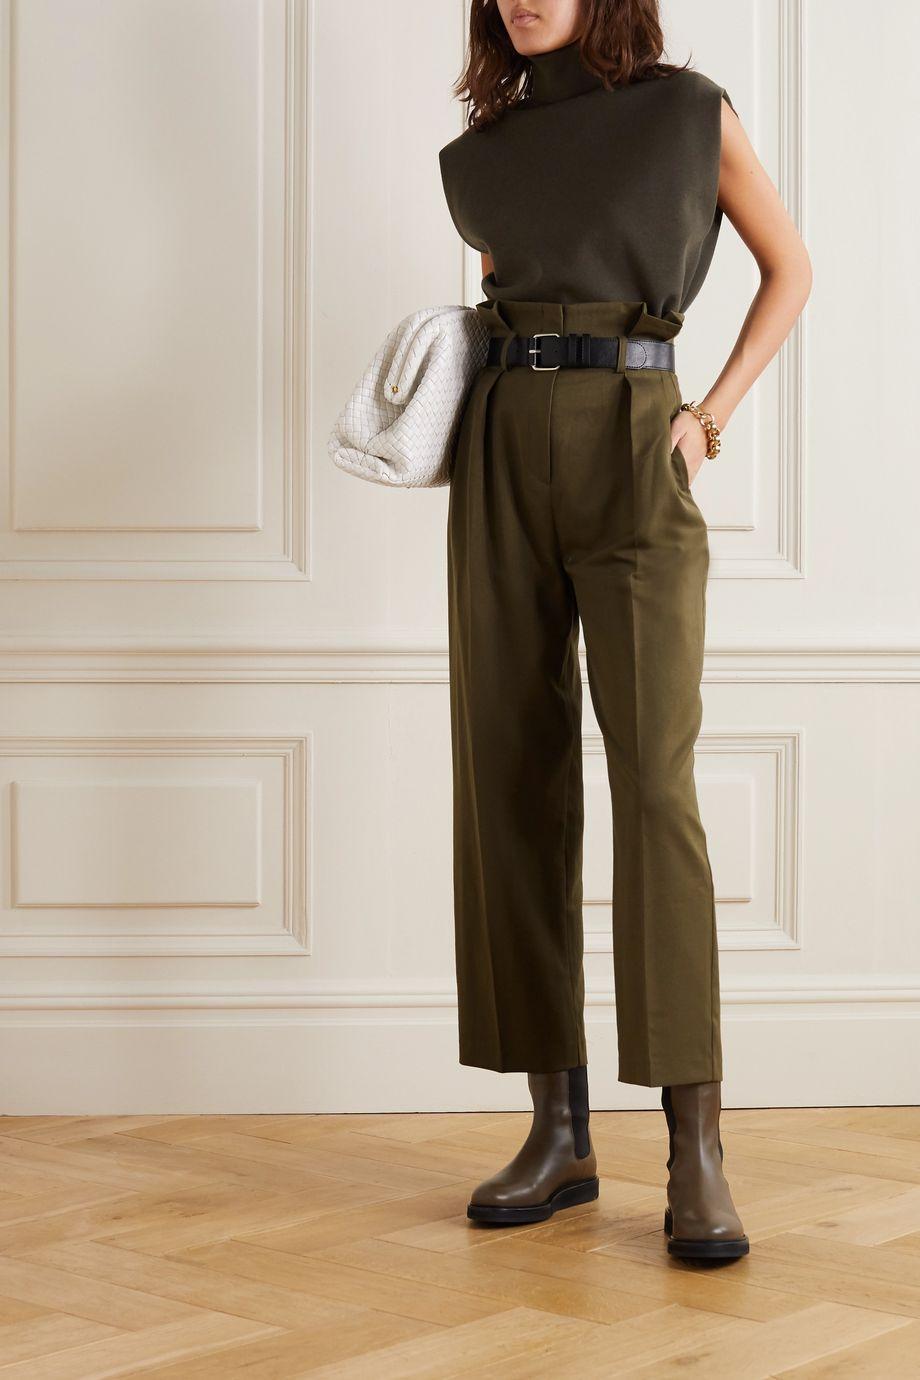 Frankie Shop 配腰带褶裥斜纹布锥形裤